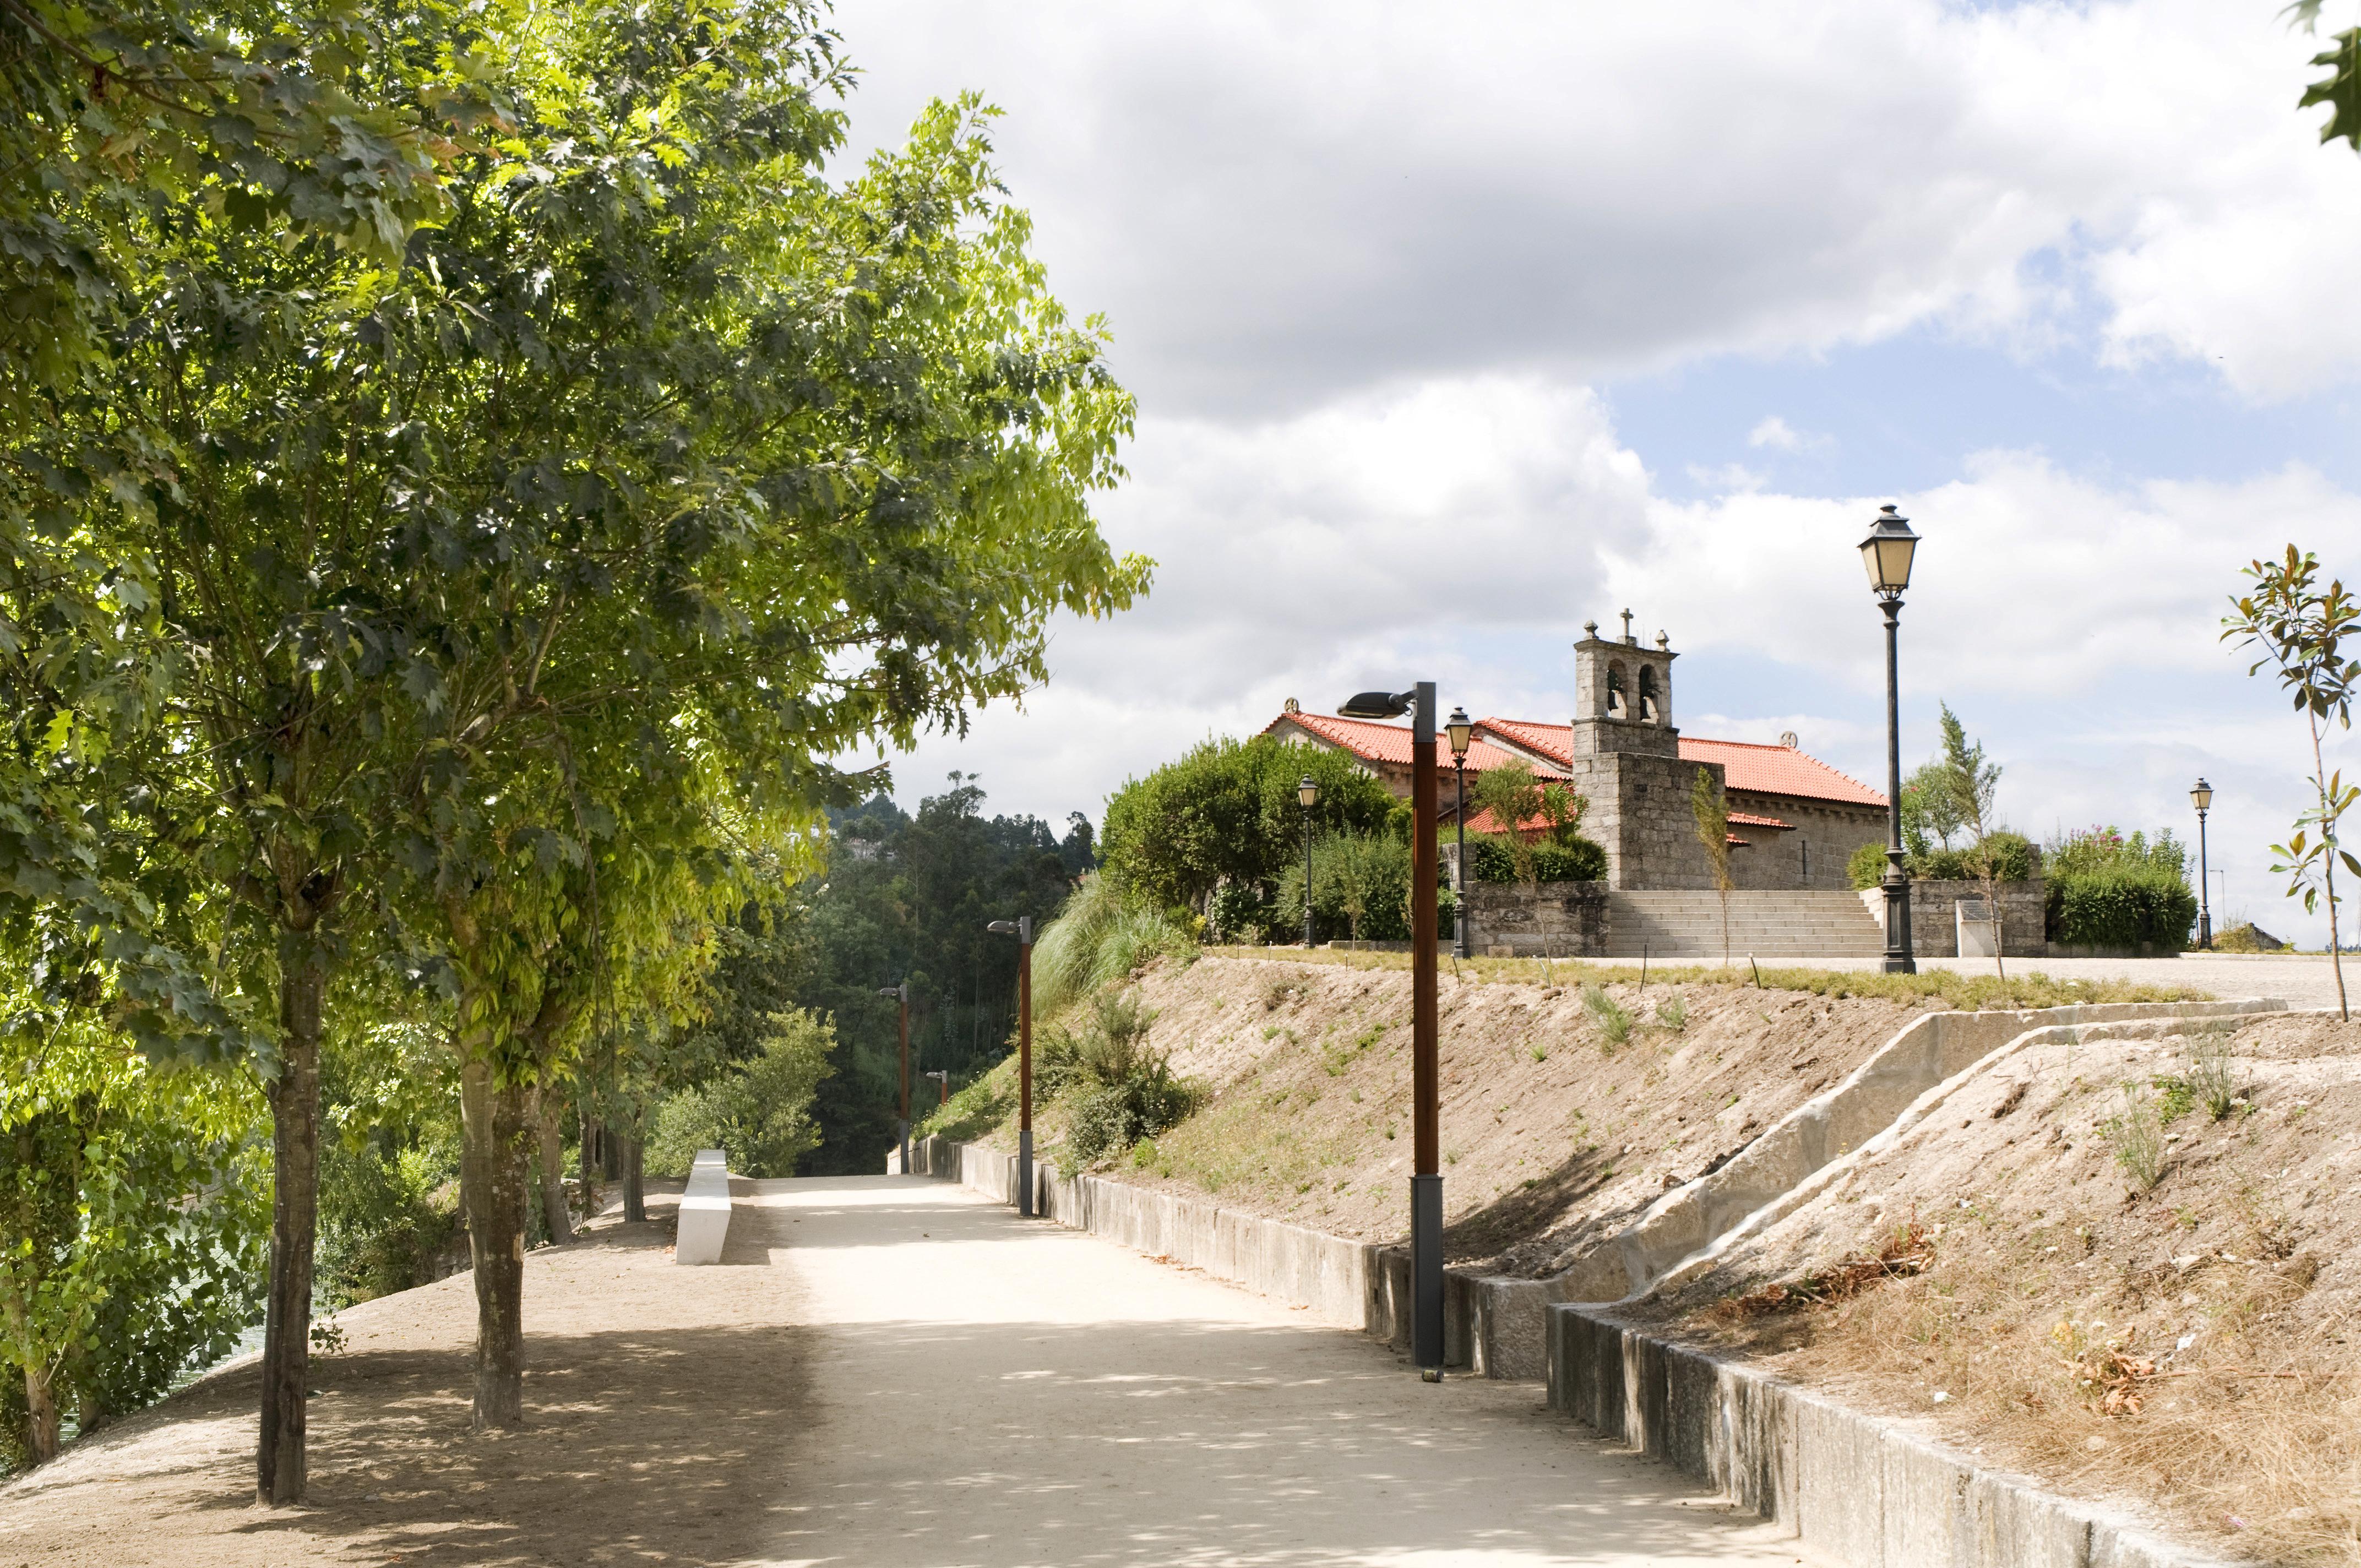 Igreja de Santa Maria de Sobretâmega e Parque Fluvial do Tâmega